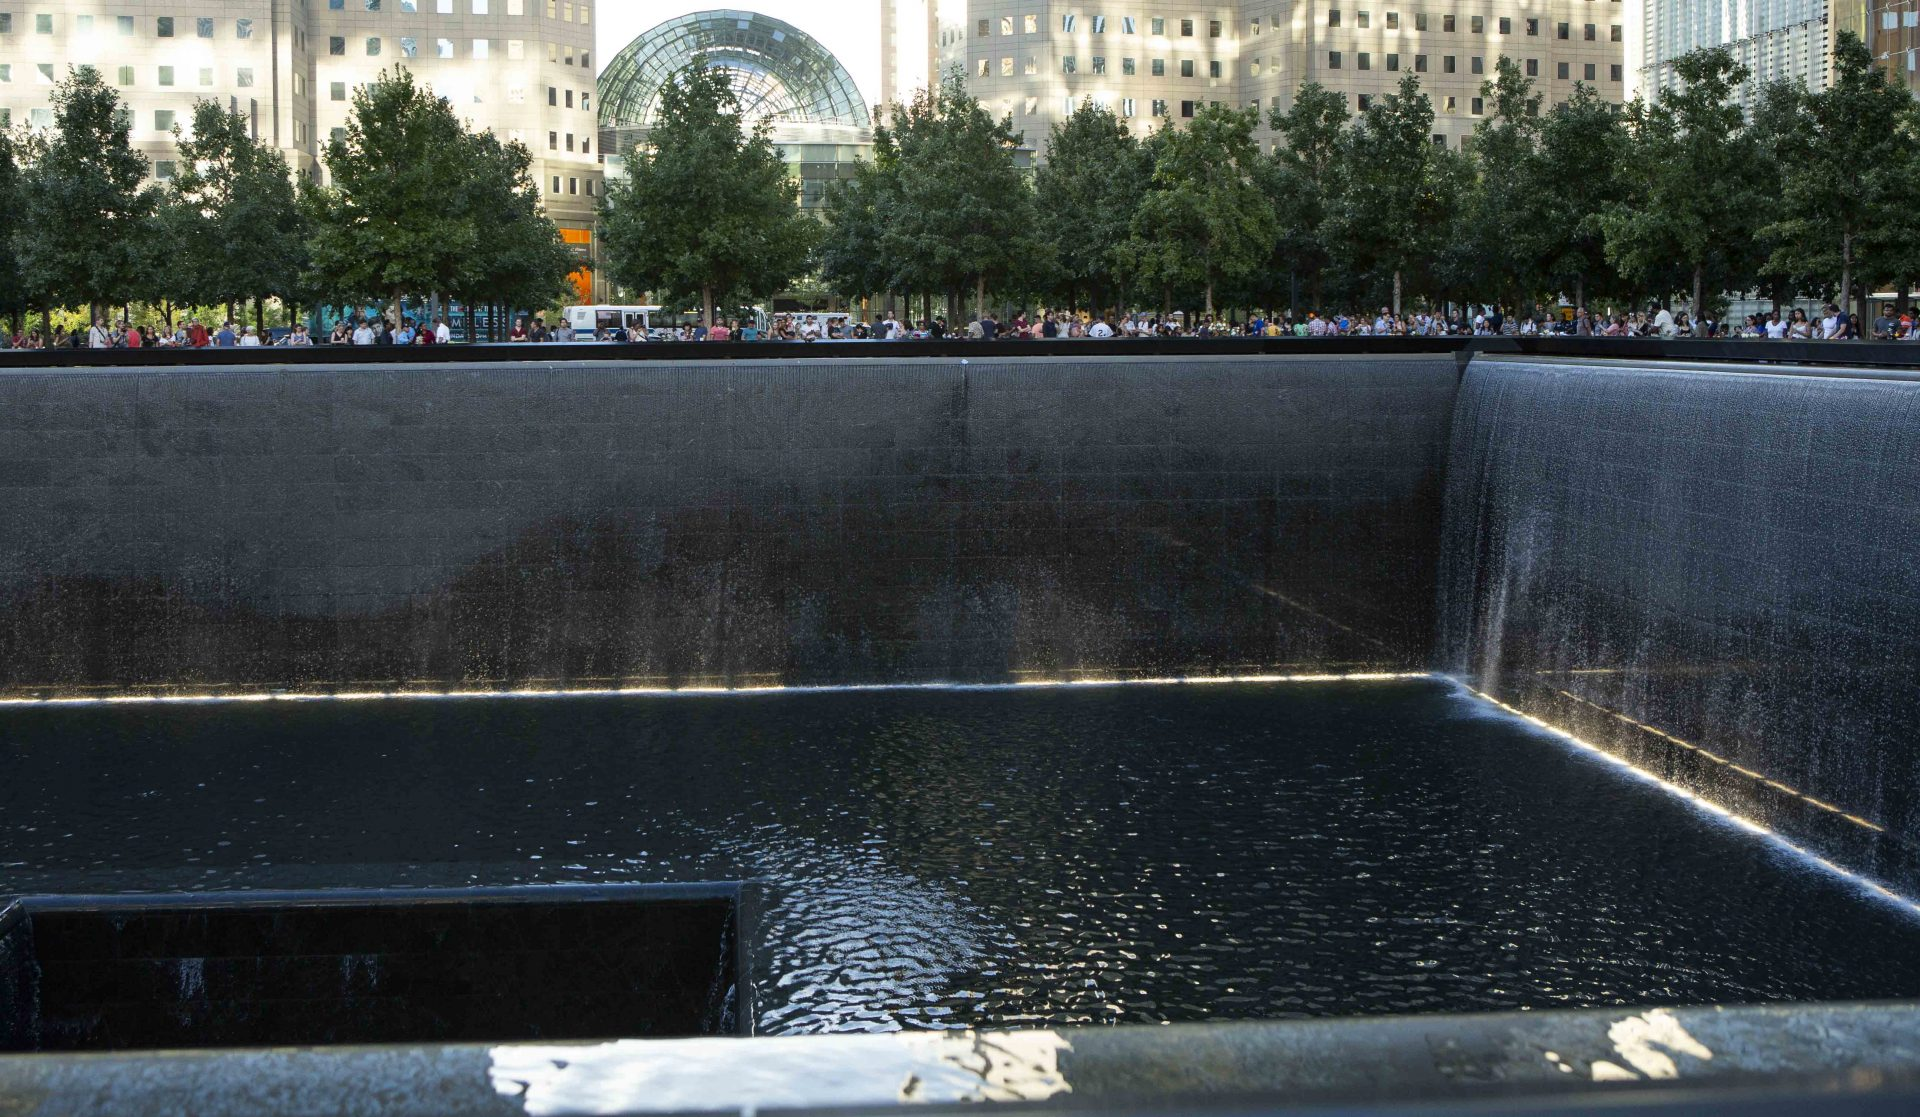 New York City, 9/11 Memorial light. (Image Credit: Hermann Rohr/ Vision Times)